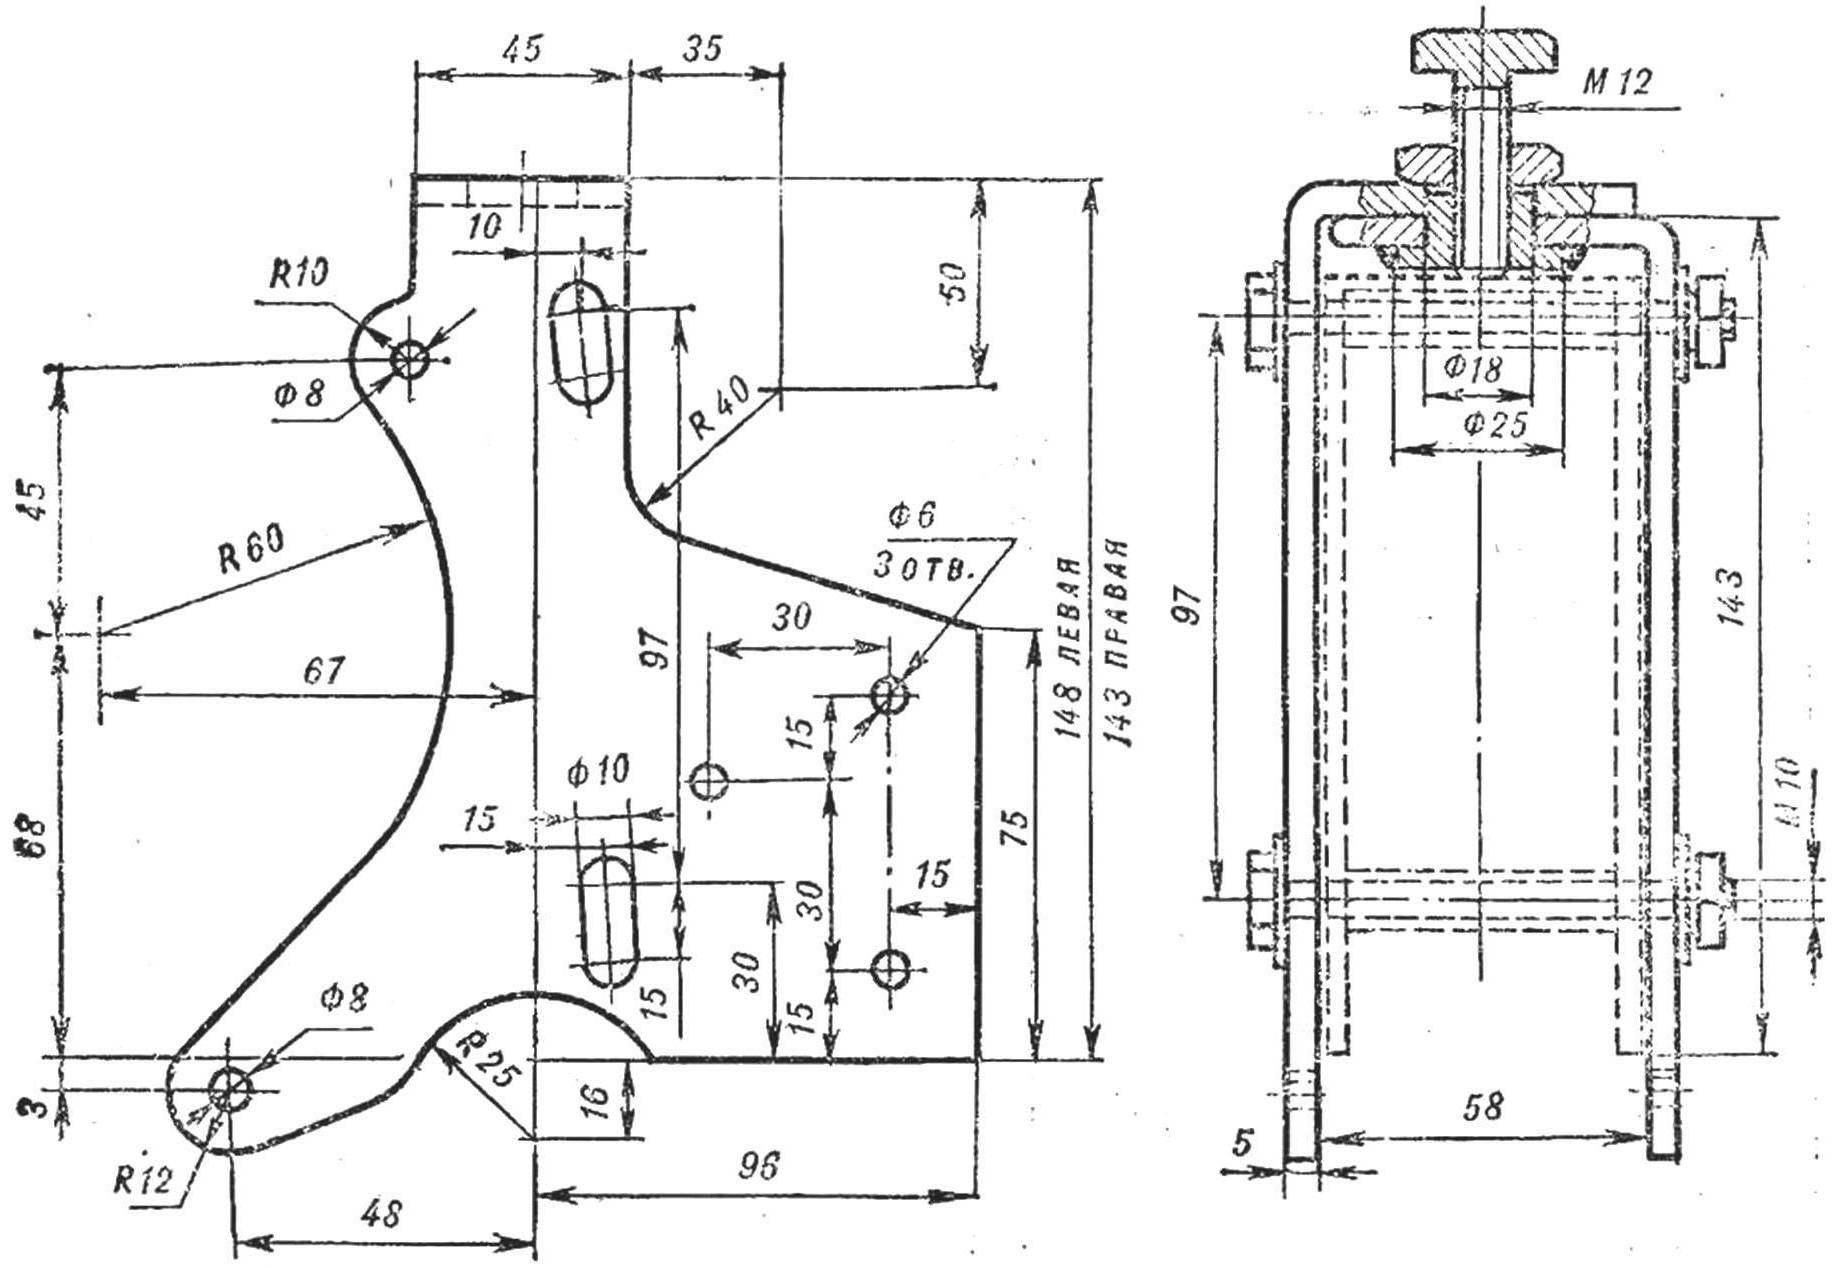 Fig. 5. Cheek rear engine mounts